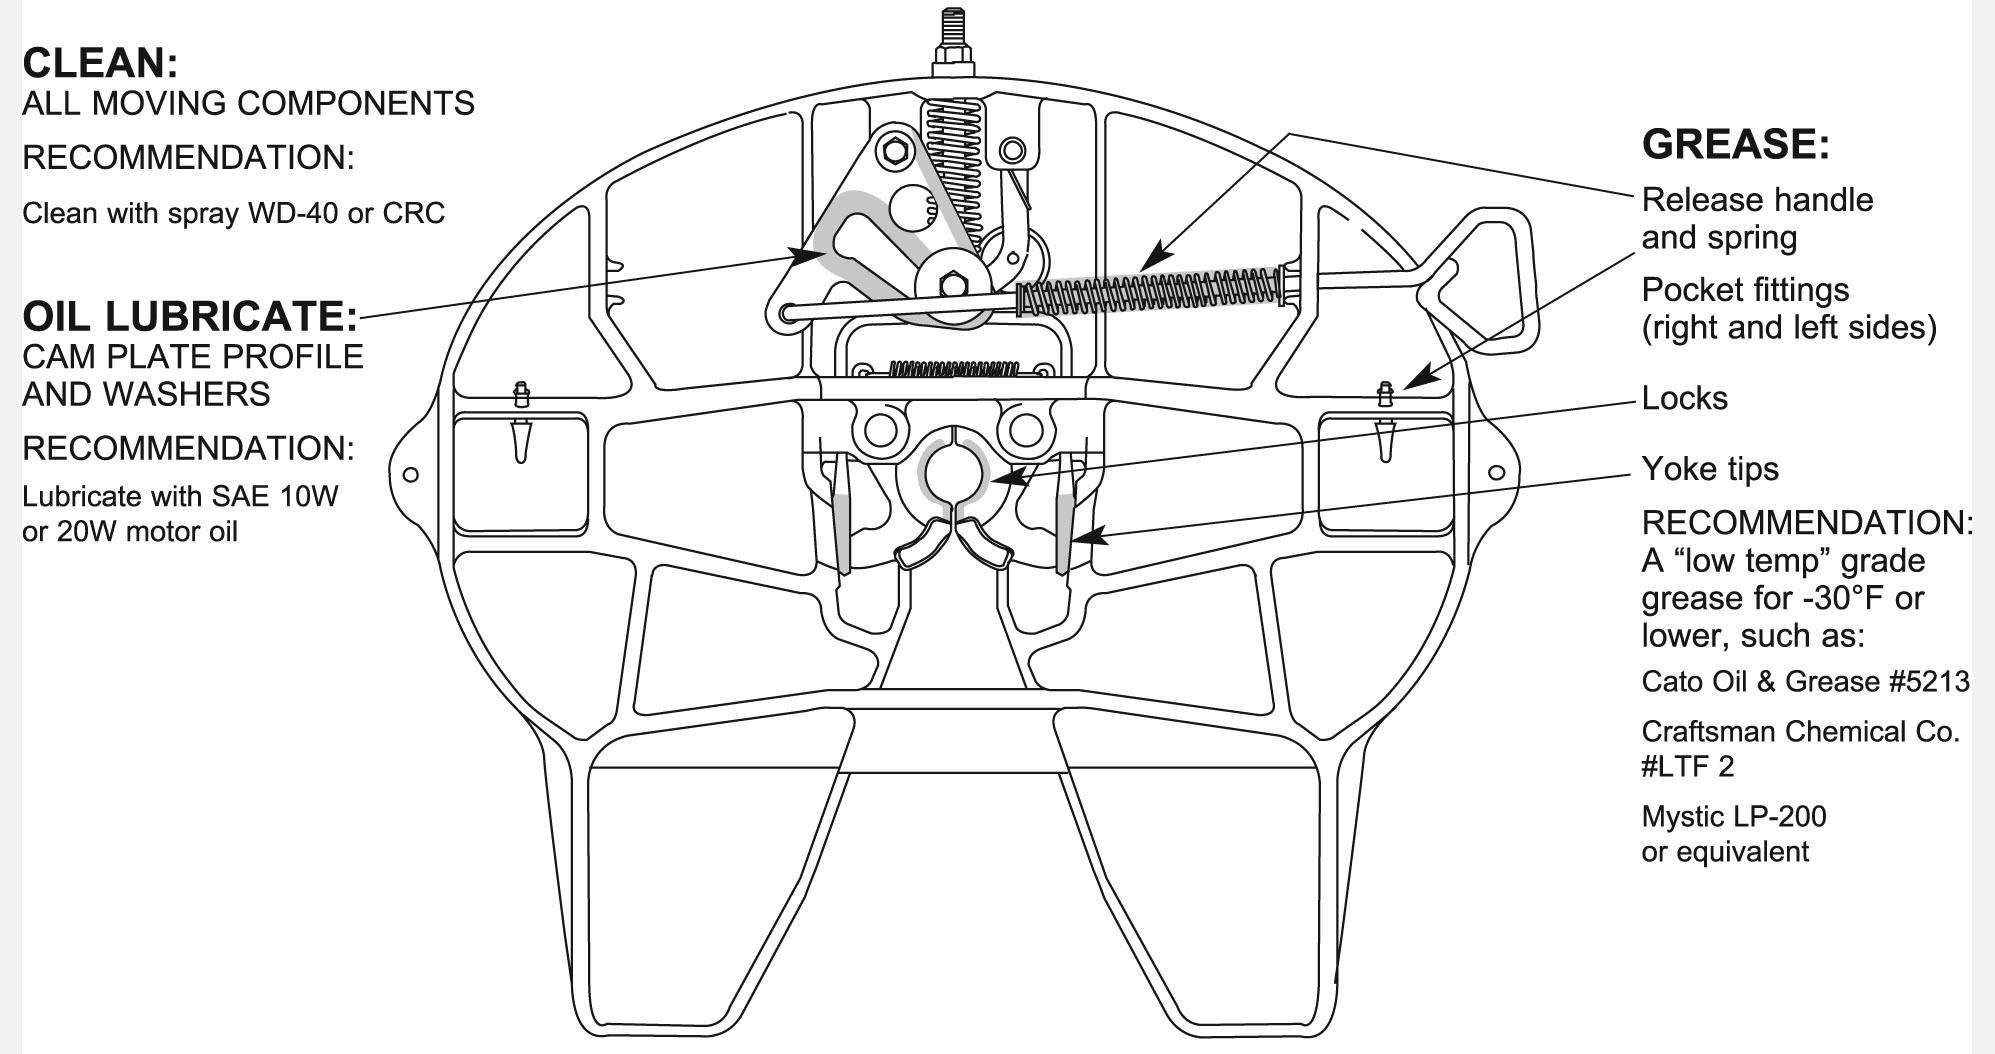 semi truck diagram nutone bath fan wiring time to grease, inspect fifth wheels, saf holland advises - maintenance trucking info